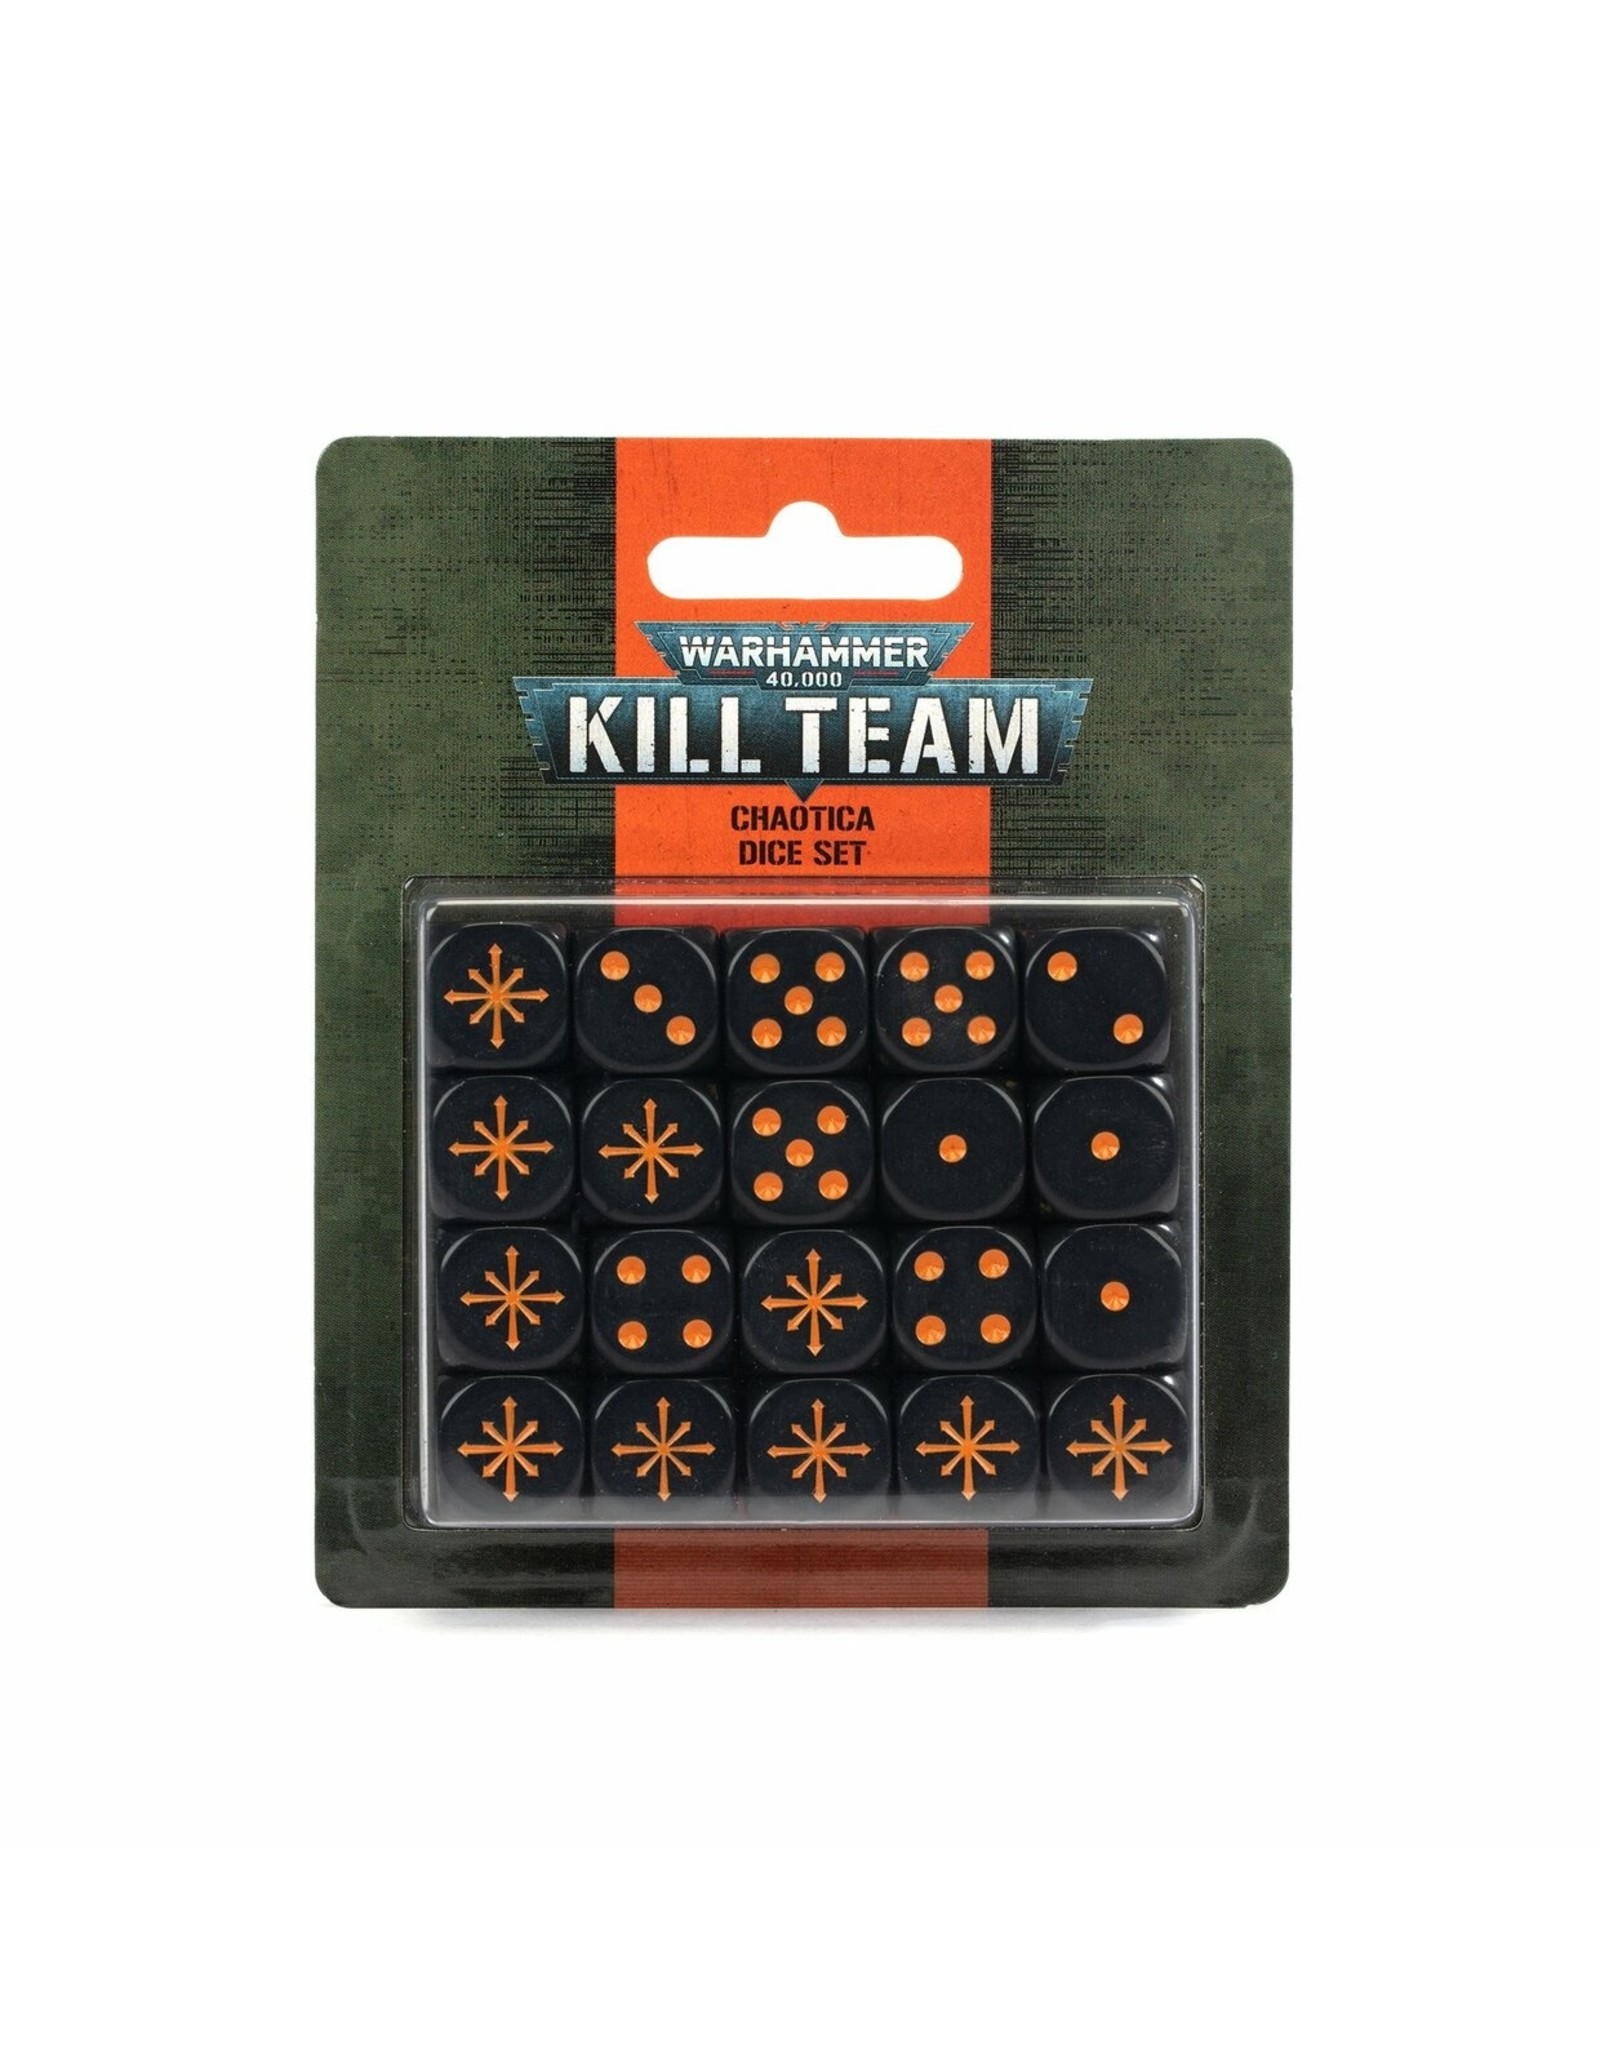 Games Workshop Kill Team 2E:  Chaotica Dice Set